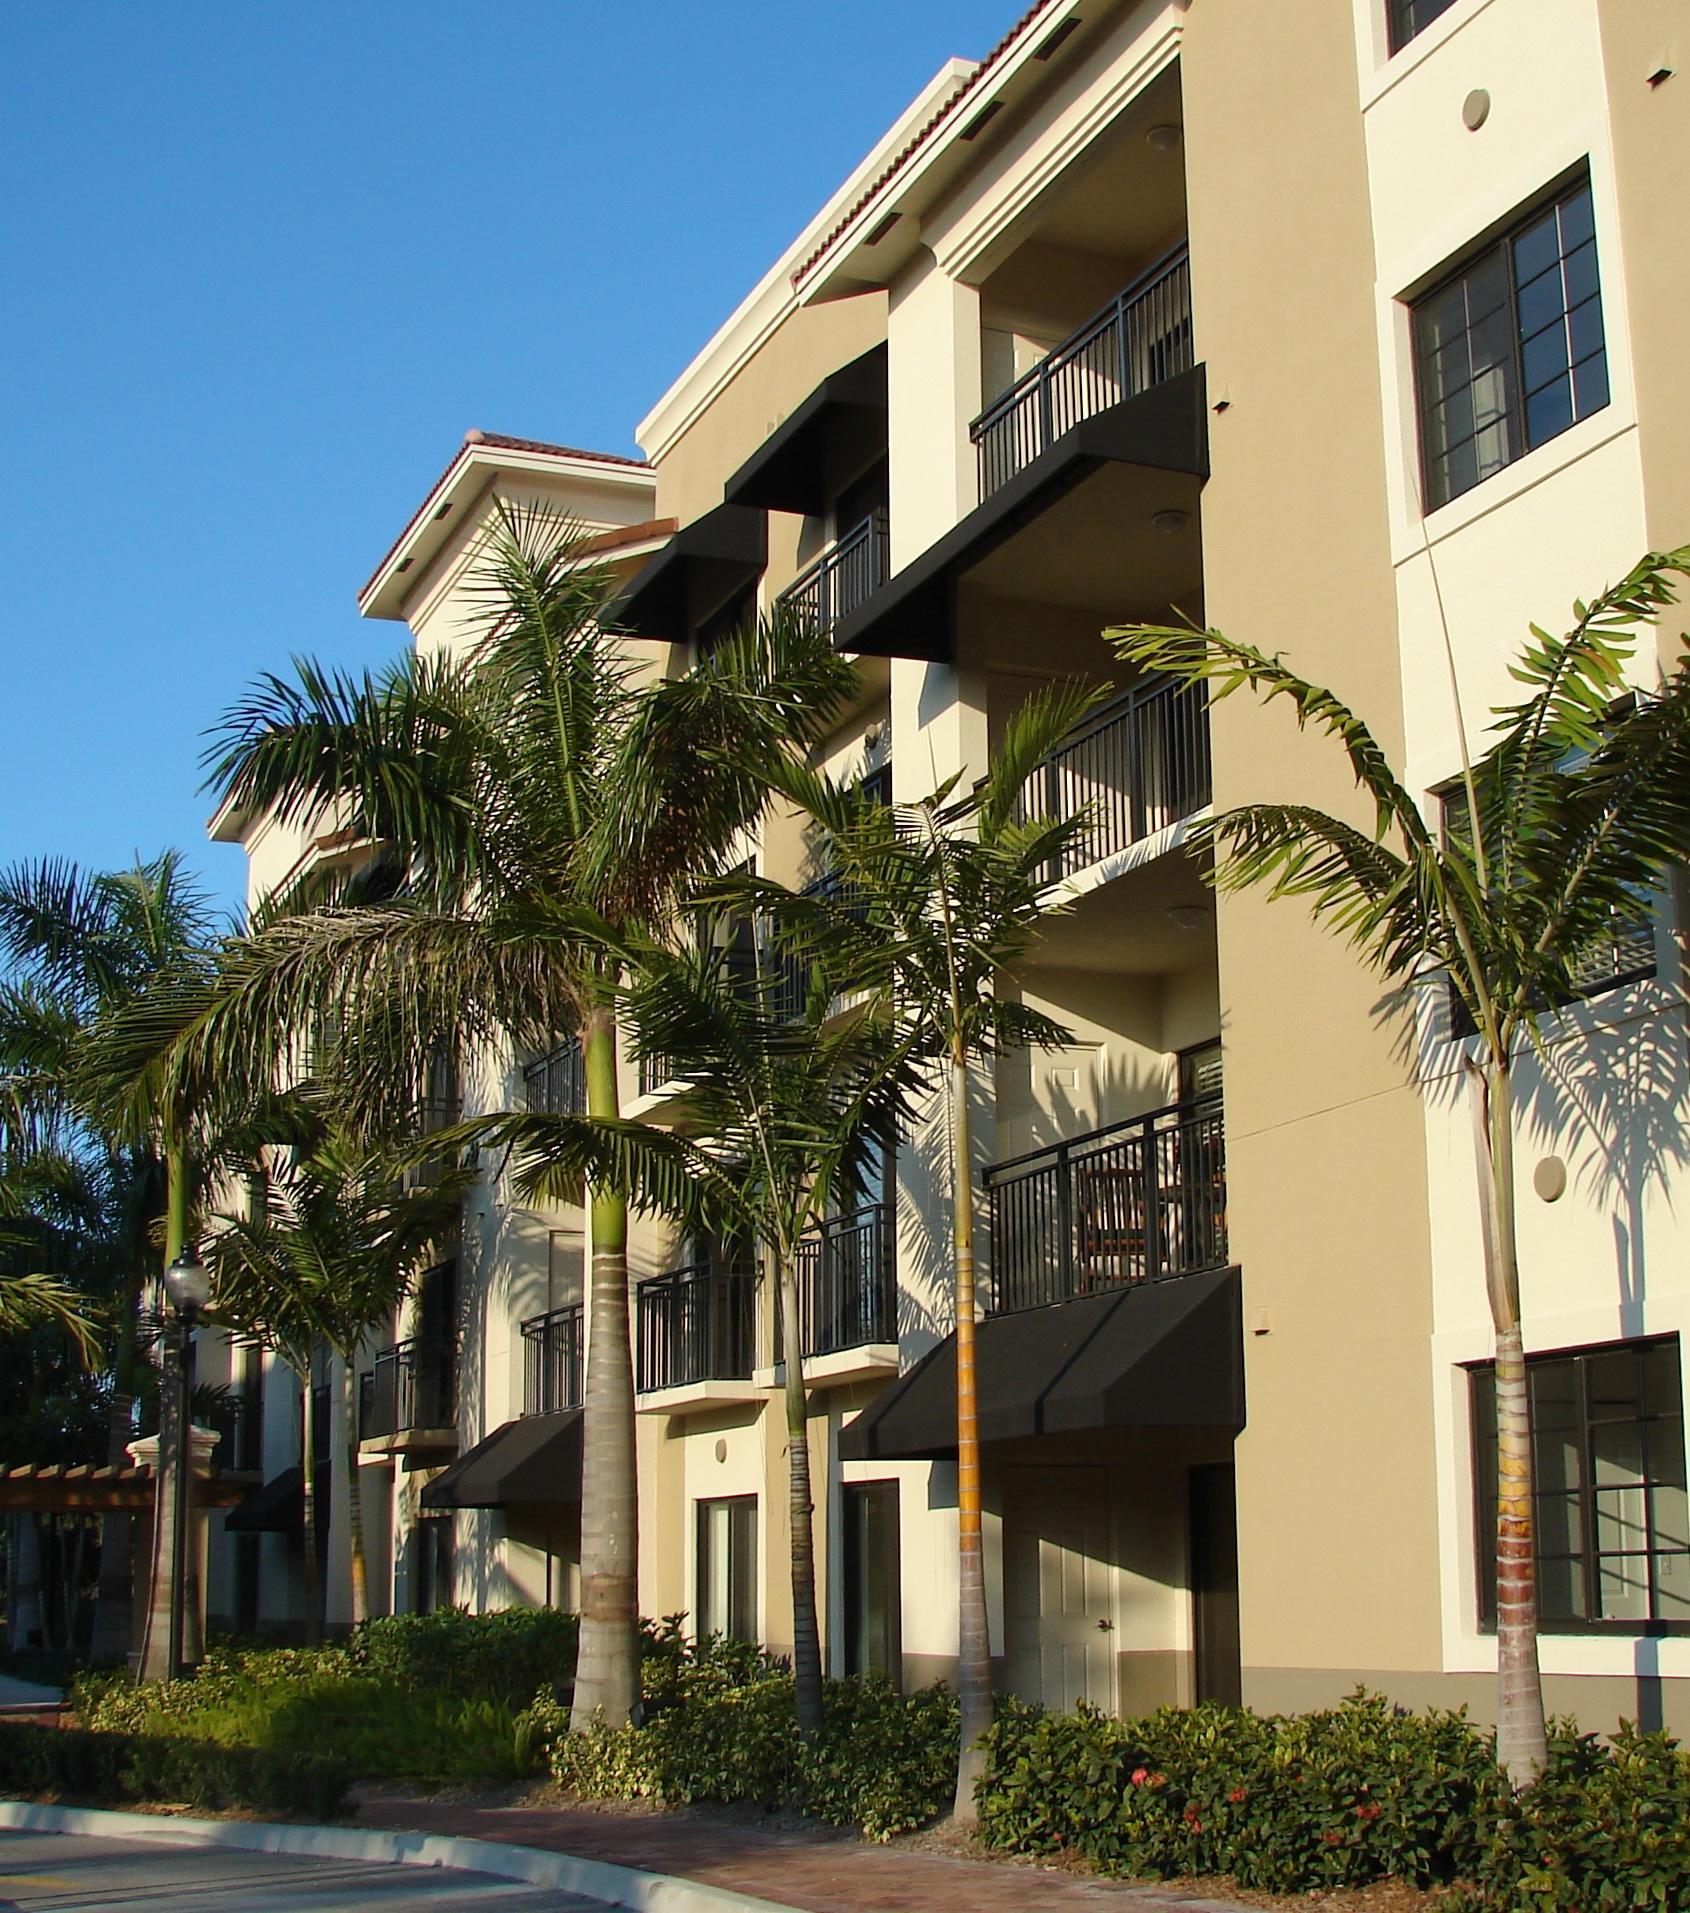 4905 Midtown 2104 Lane #2104 - 33418 - FL - Palm Beach Gardens